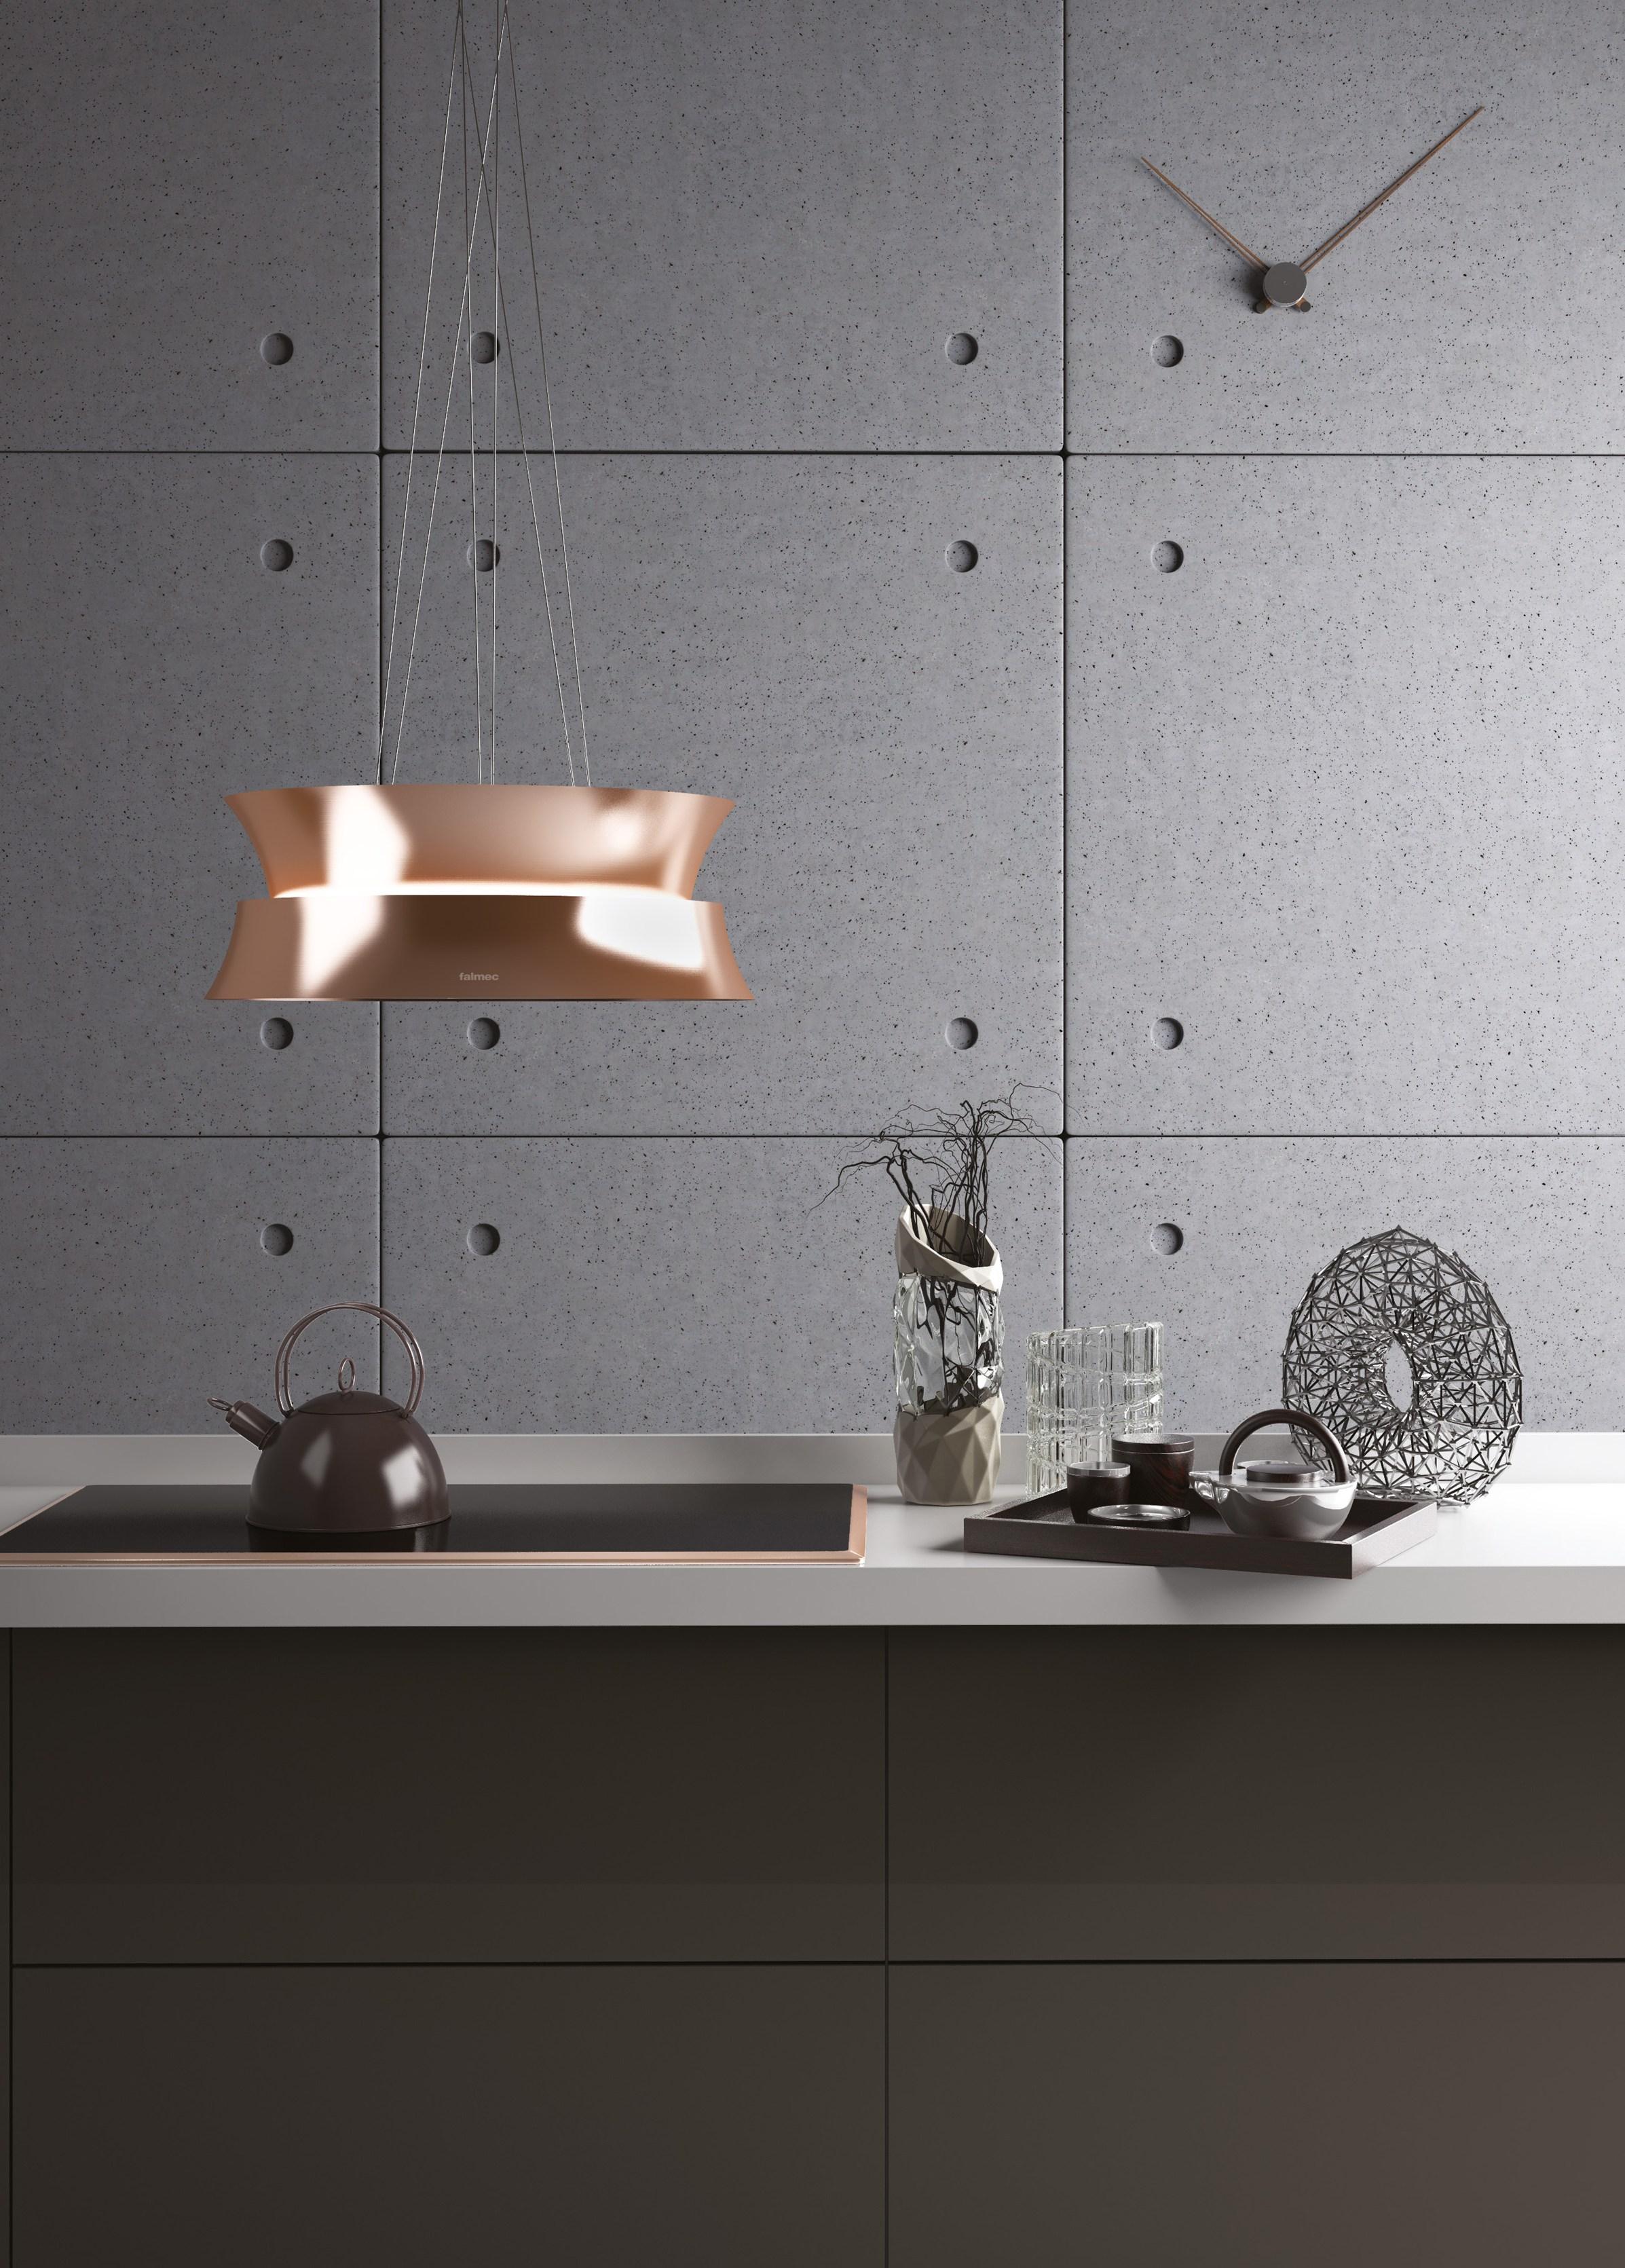 hotte falmec dama2260 pas cher. Black Bedroom Furniture Sets. Home Design Ideas